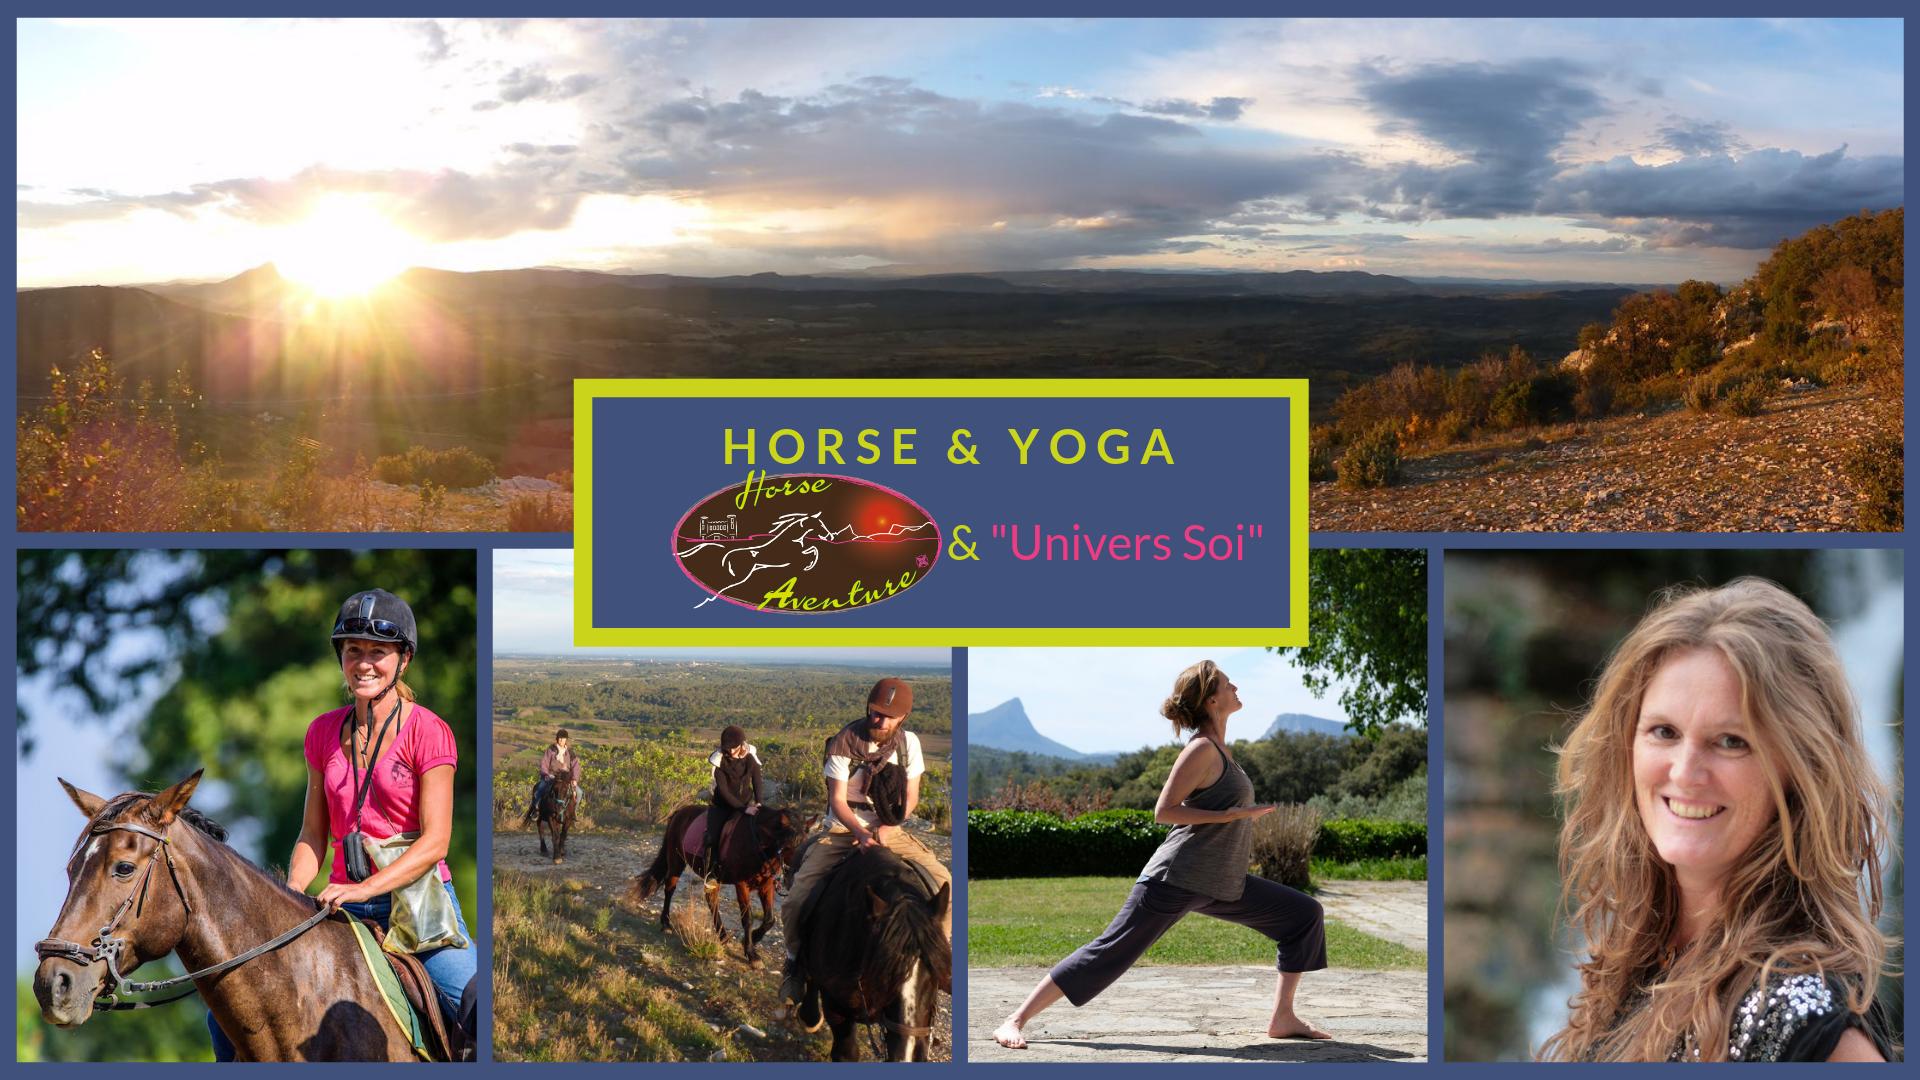 HORSE & YOGA Montpellier balade à cheval